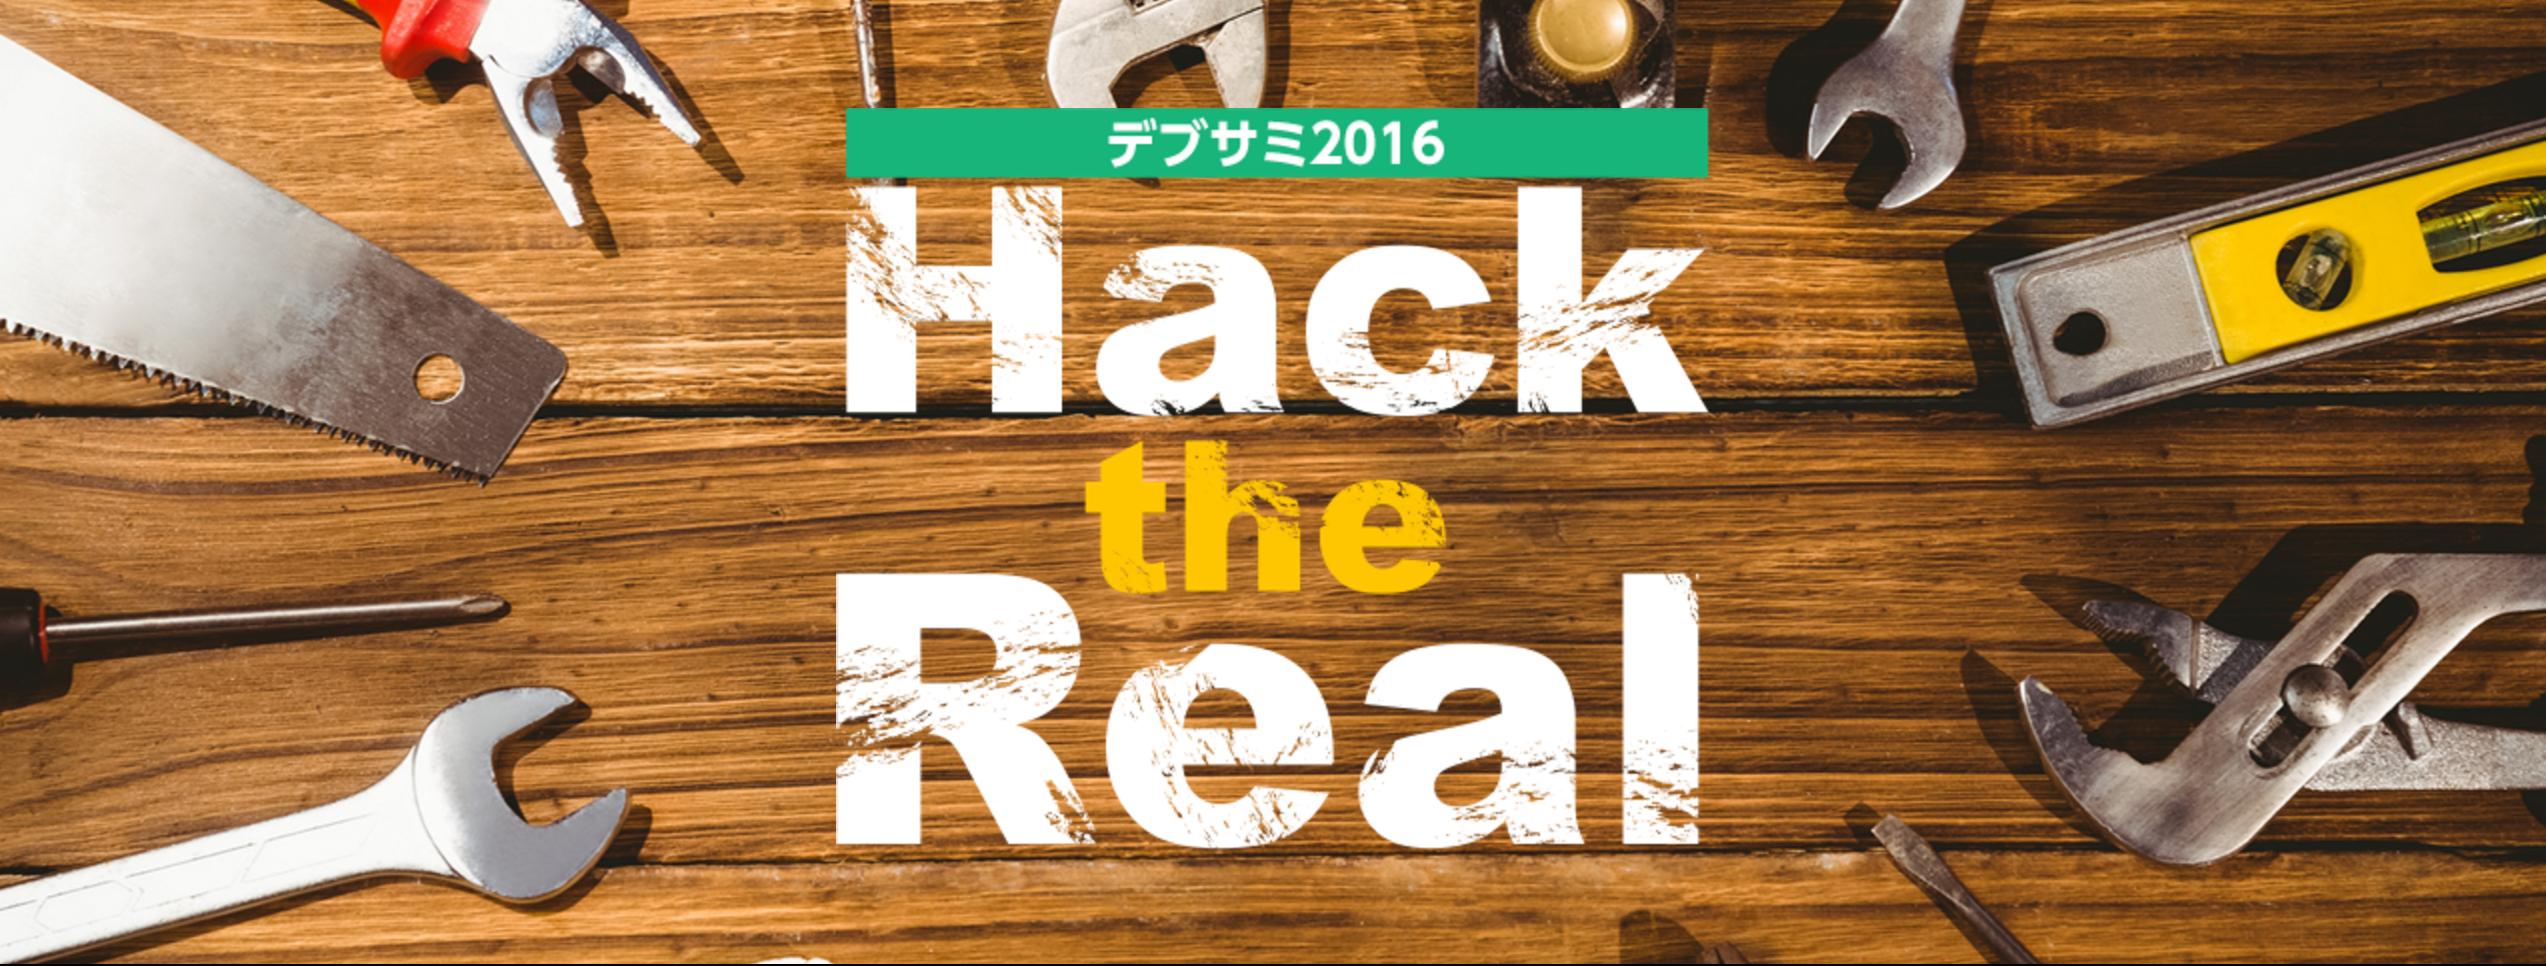 Developers Summit 2016で個人的に興味深かったセッション備忘録